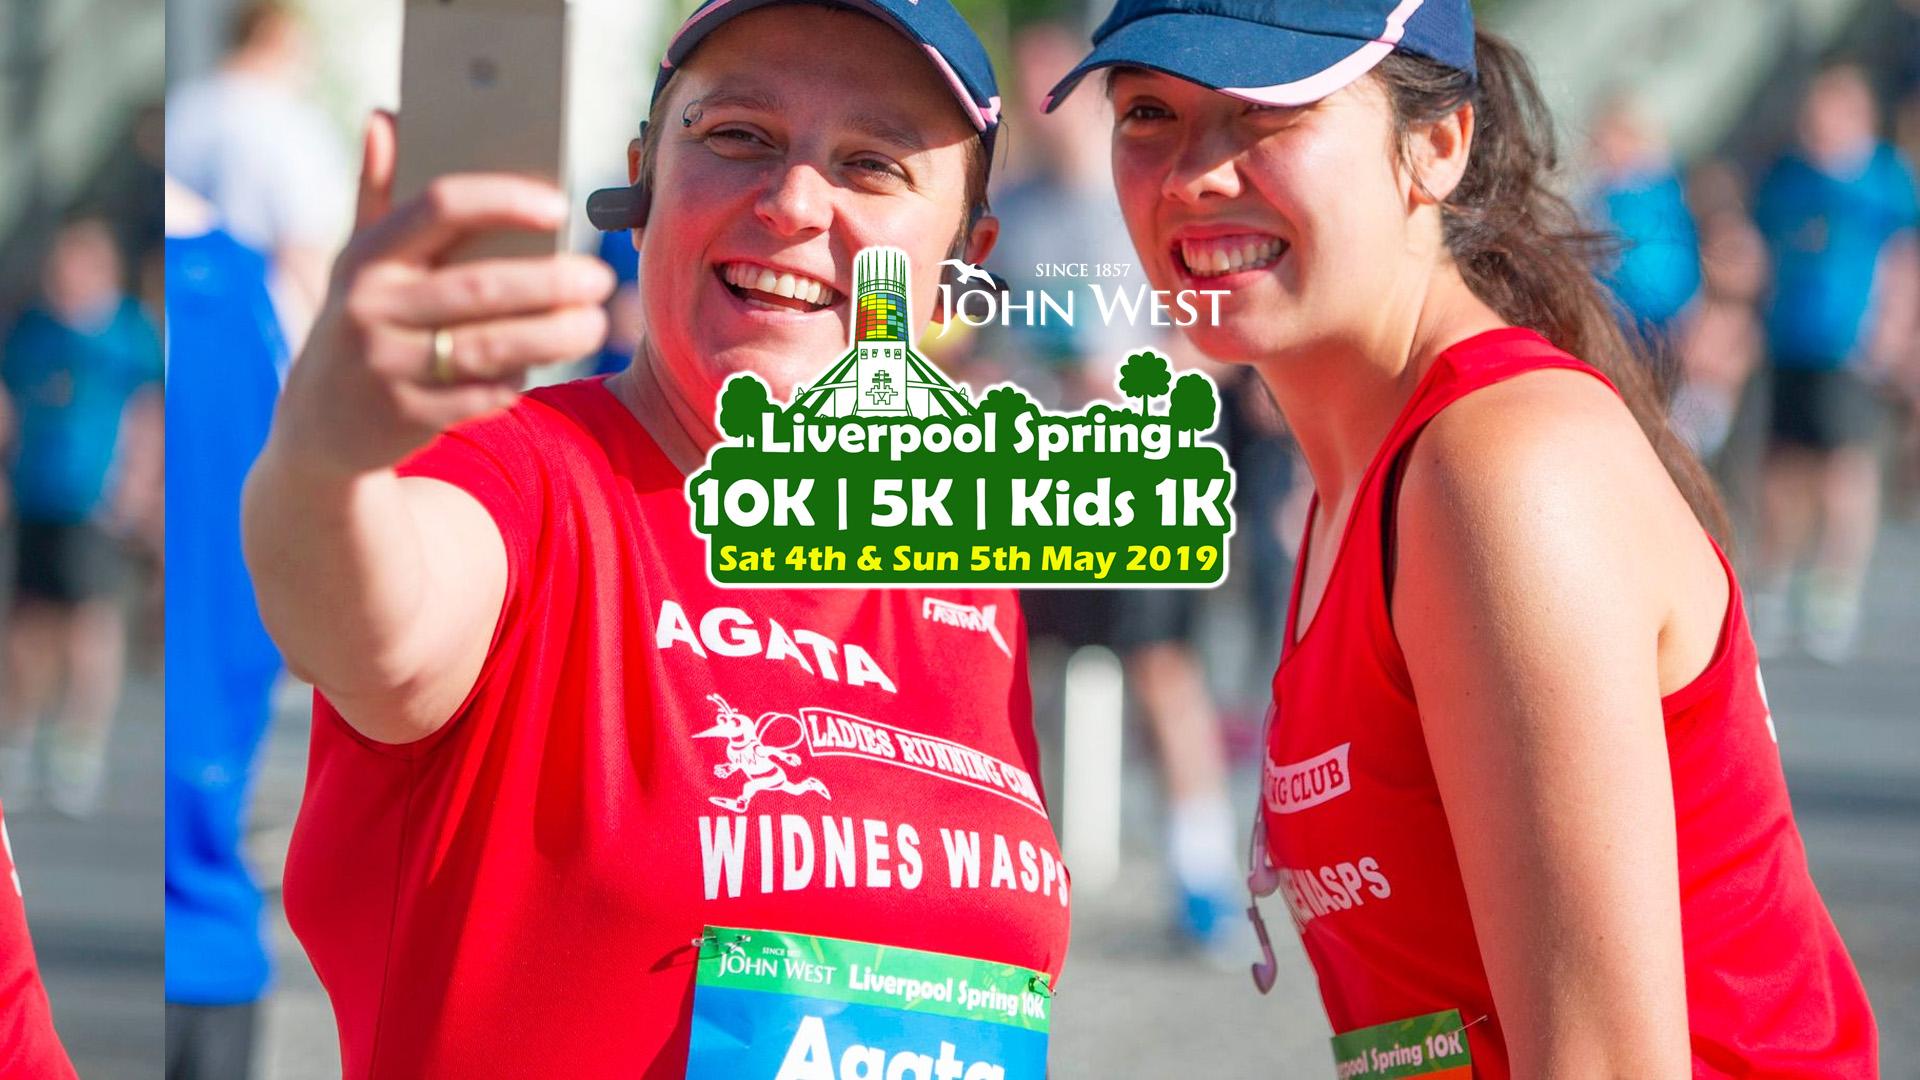 Race event | Liverpool Spring 10k/5k | Racecheck